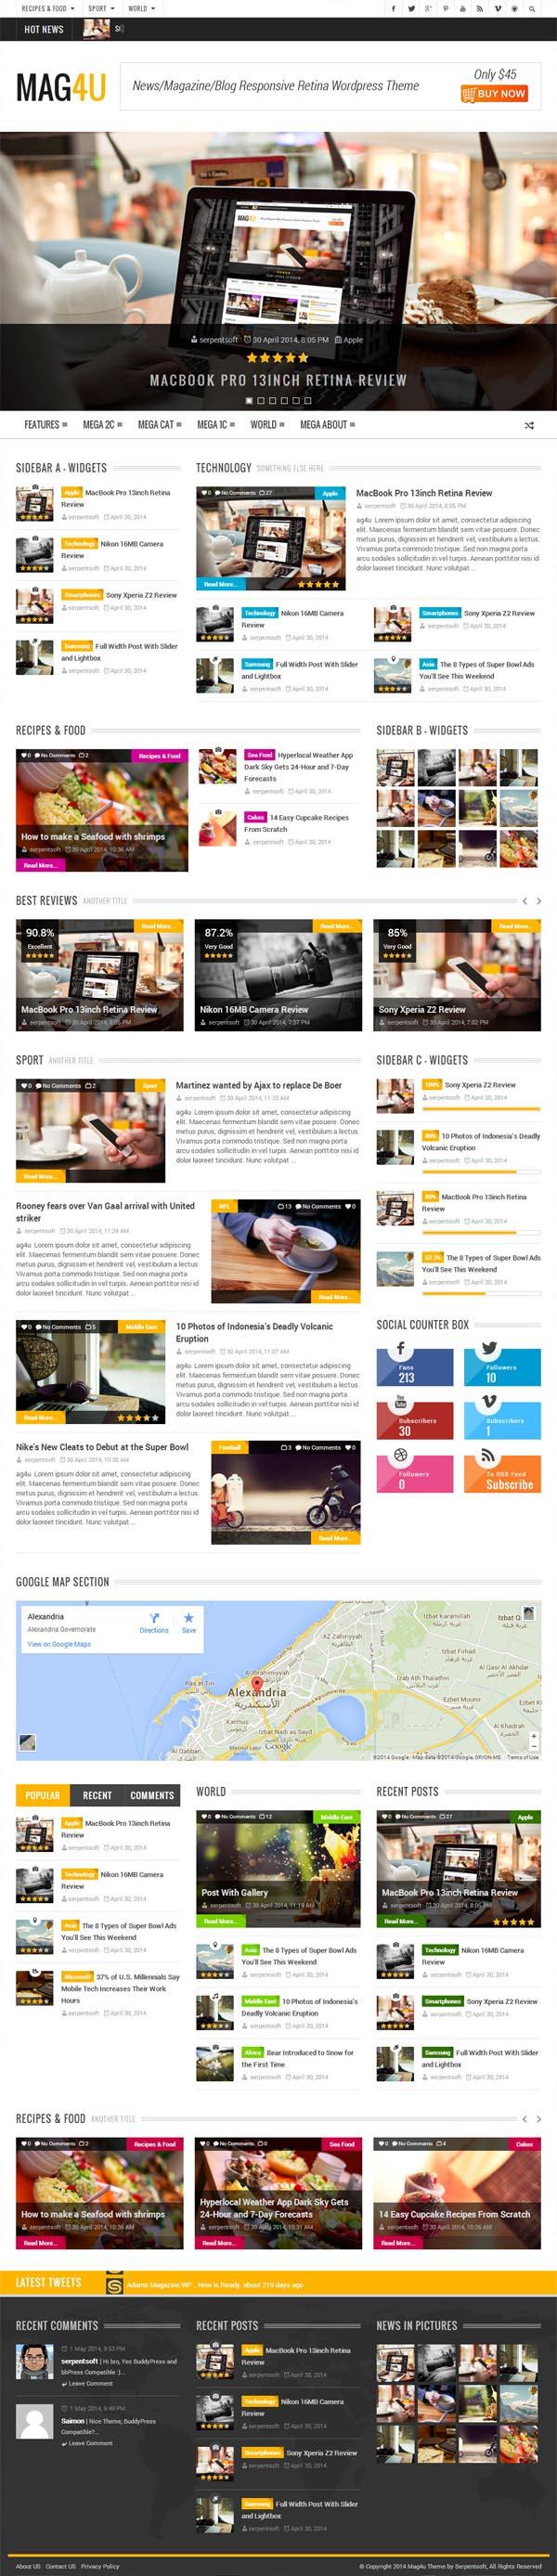 Mag4u – Responsive WordPress News, Magazine, Blog